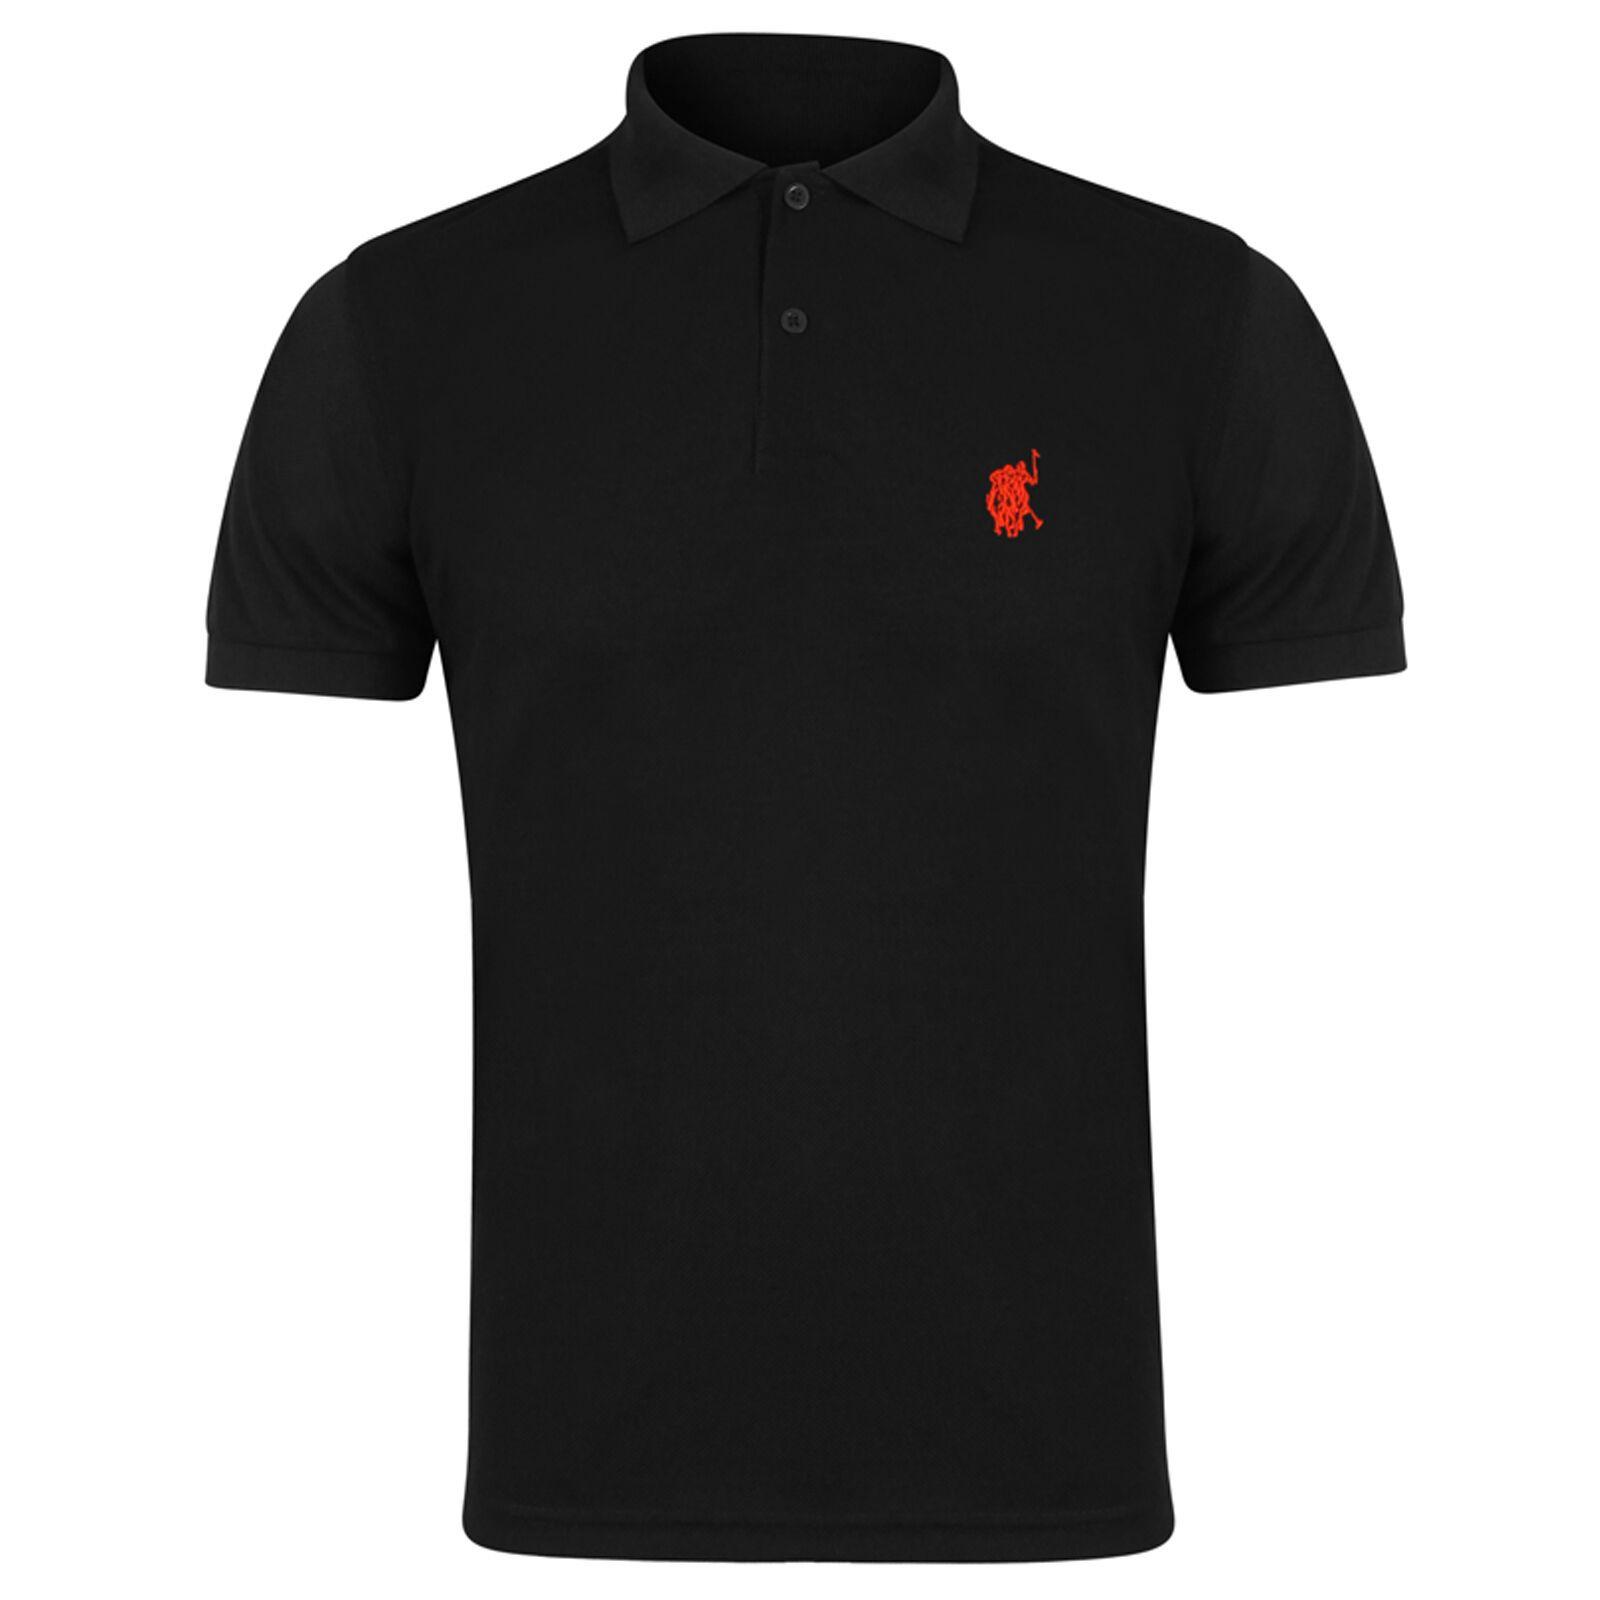 Mens Polo Shirt Short Sleeve Designer Shirts Top Plain